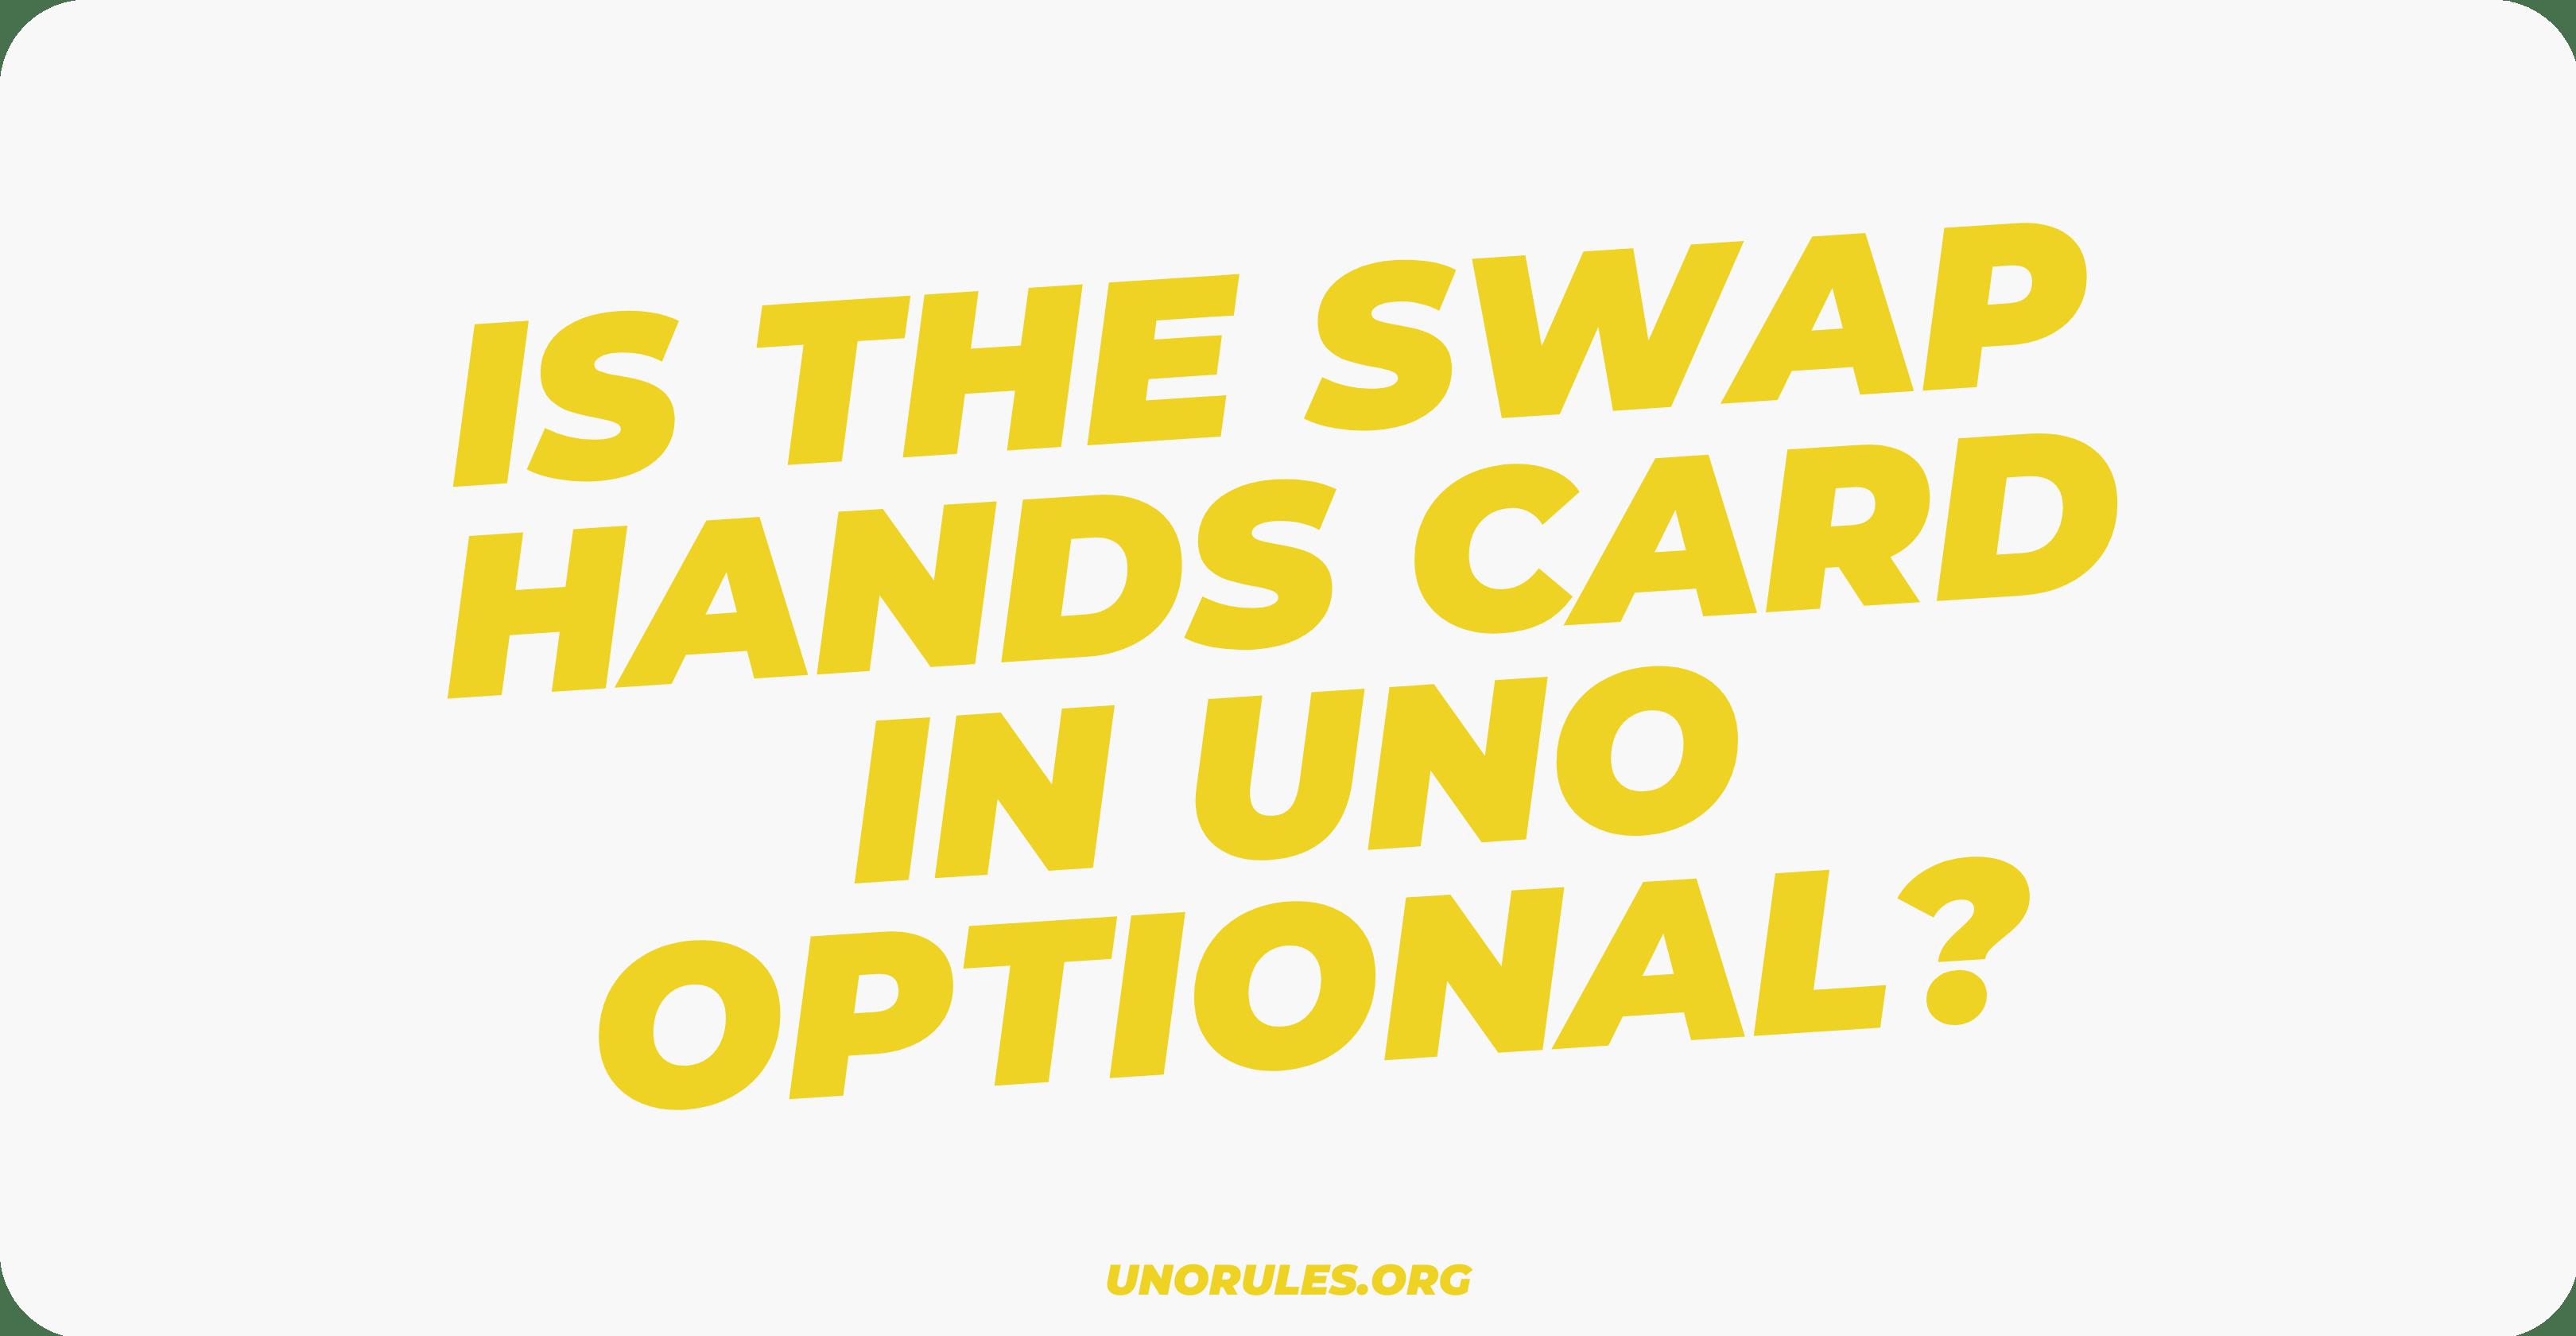 Is the Swap Hands Card in Uno optional